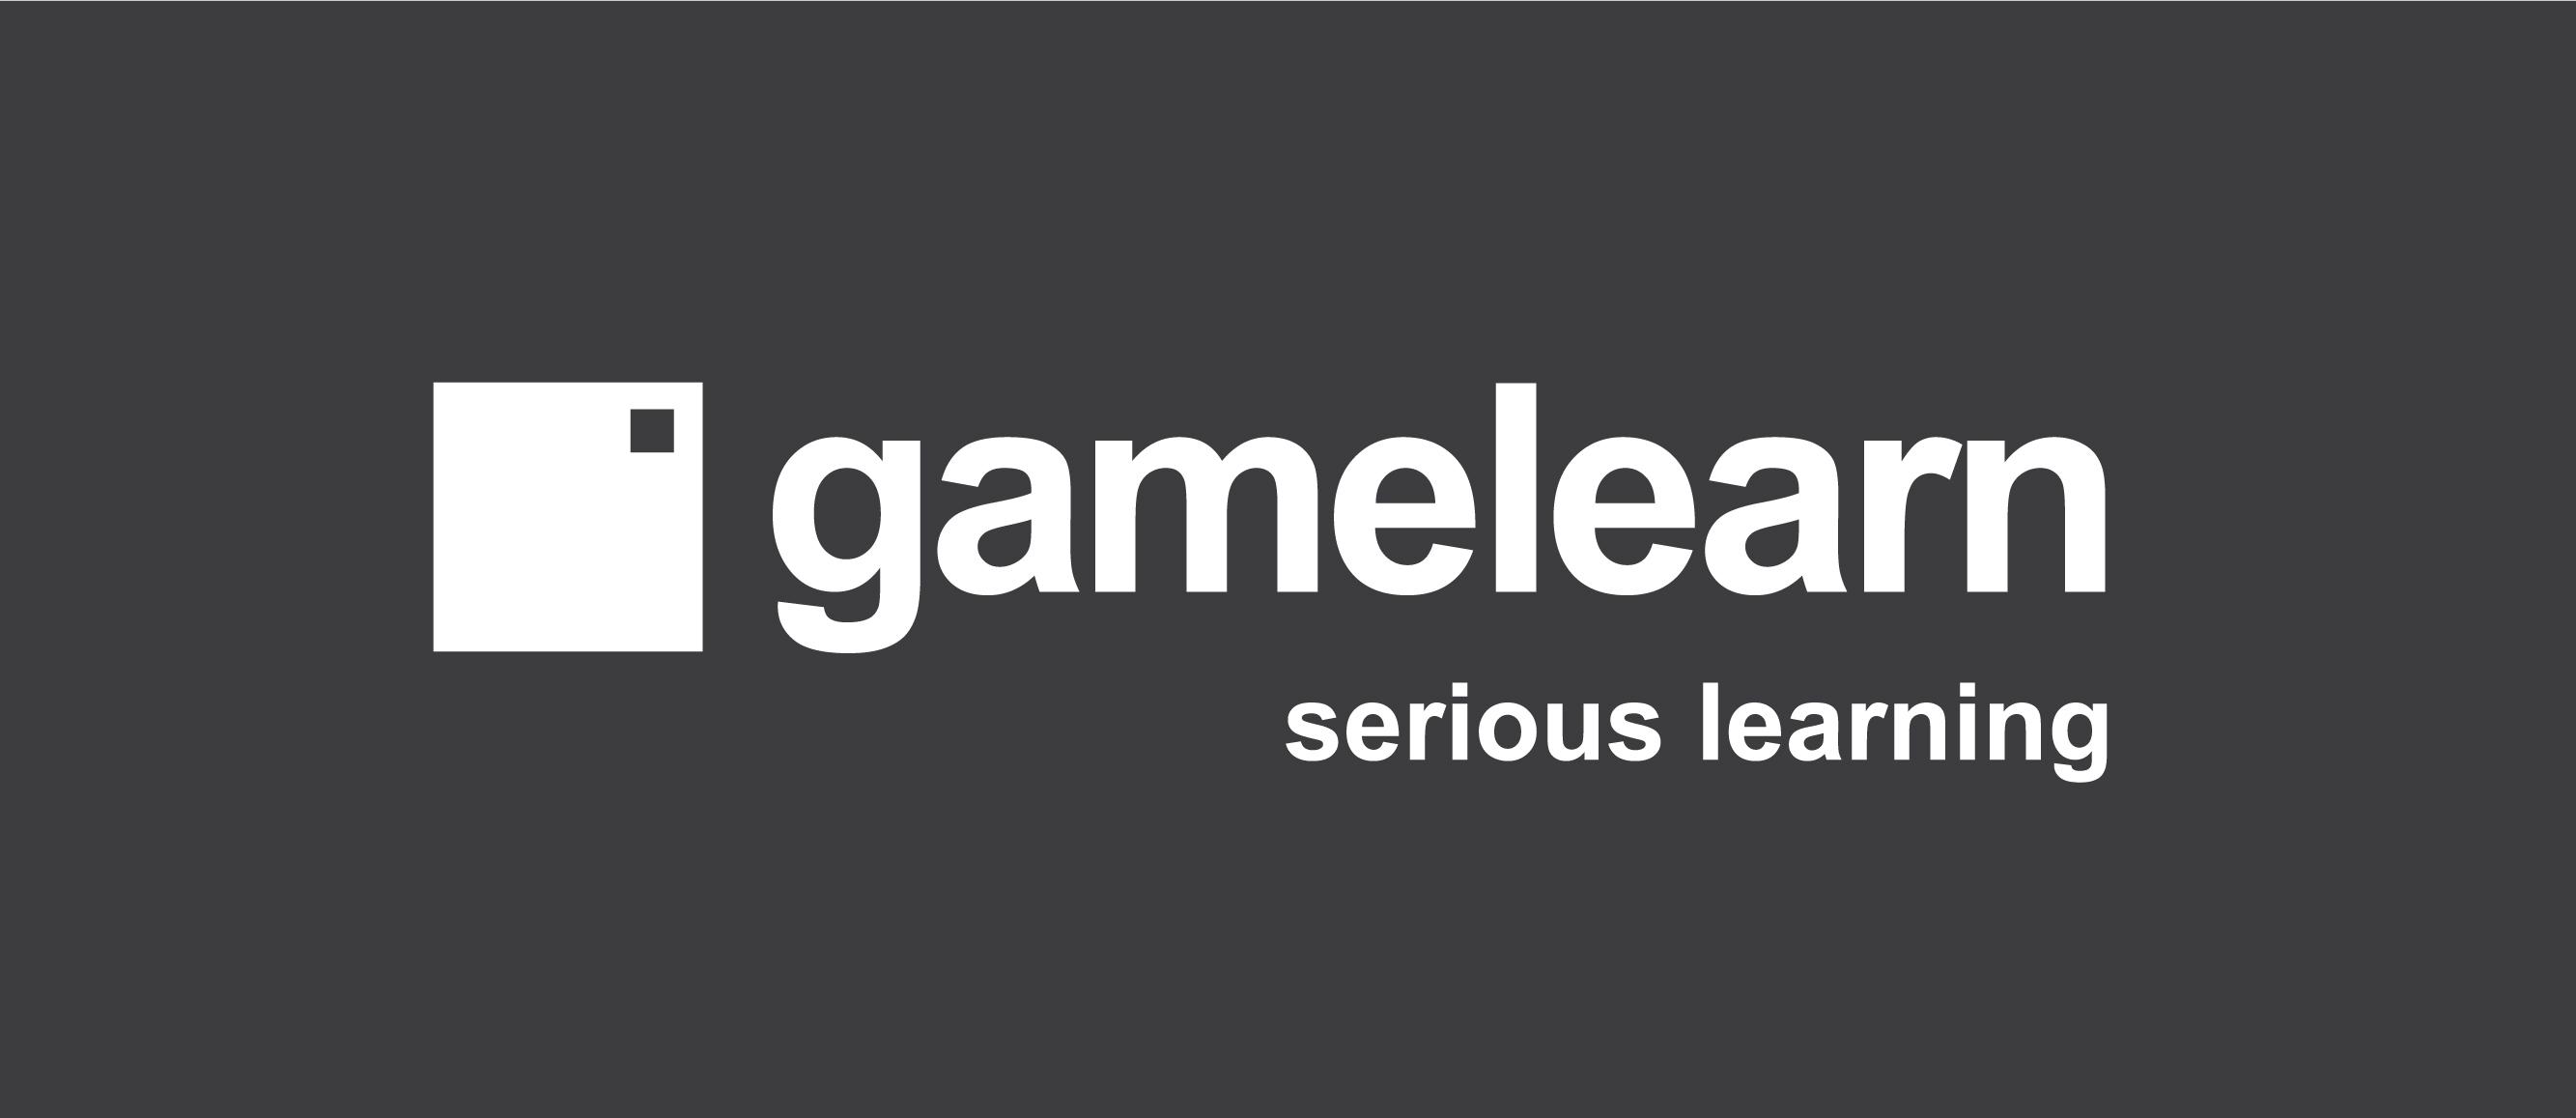 Fotografia 1360929355_gamelearn-serious-fondogris.jpg